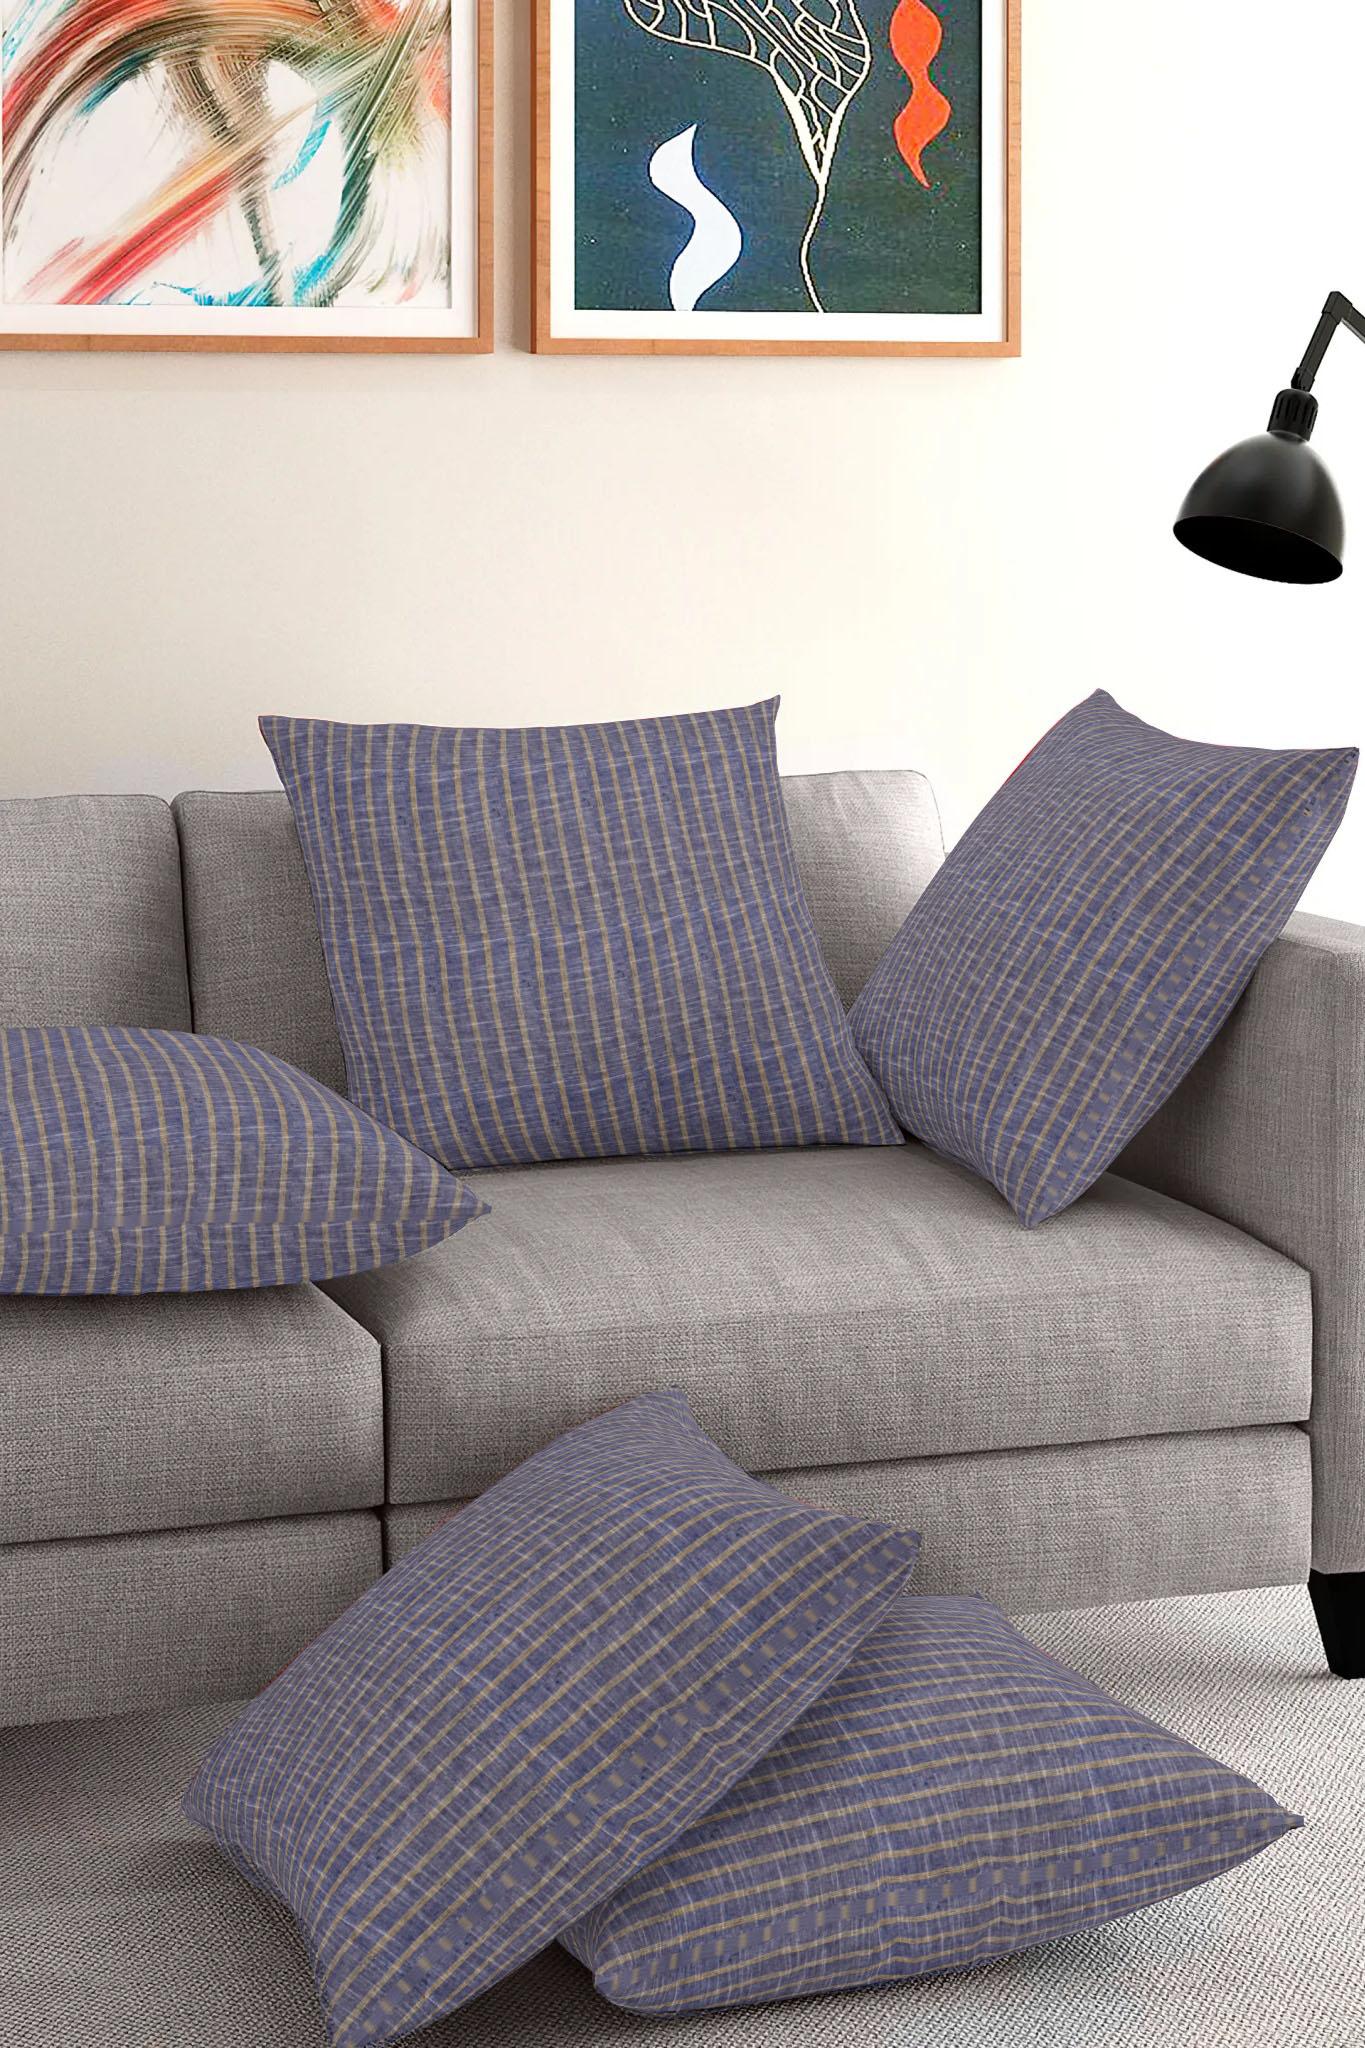 /home/customer/www/fabartcraft.com/public_html/uploadshttps://www.shopolics.com/uploads/images/medium/Gray-White-Cotton-Cushion-Cover-35374.jpg